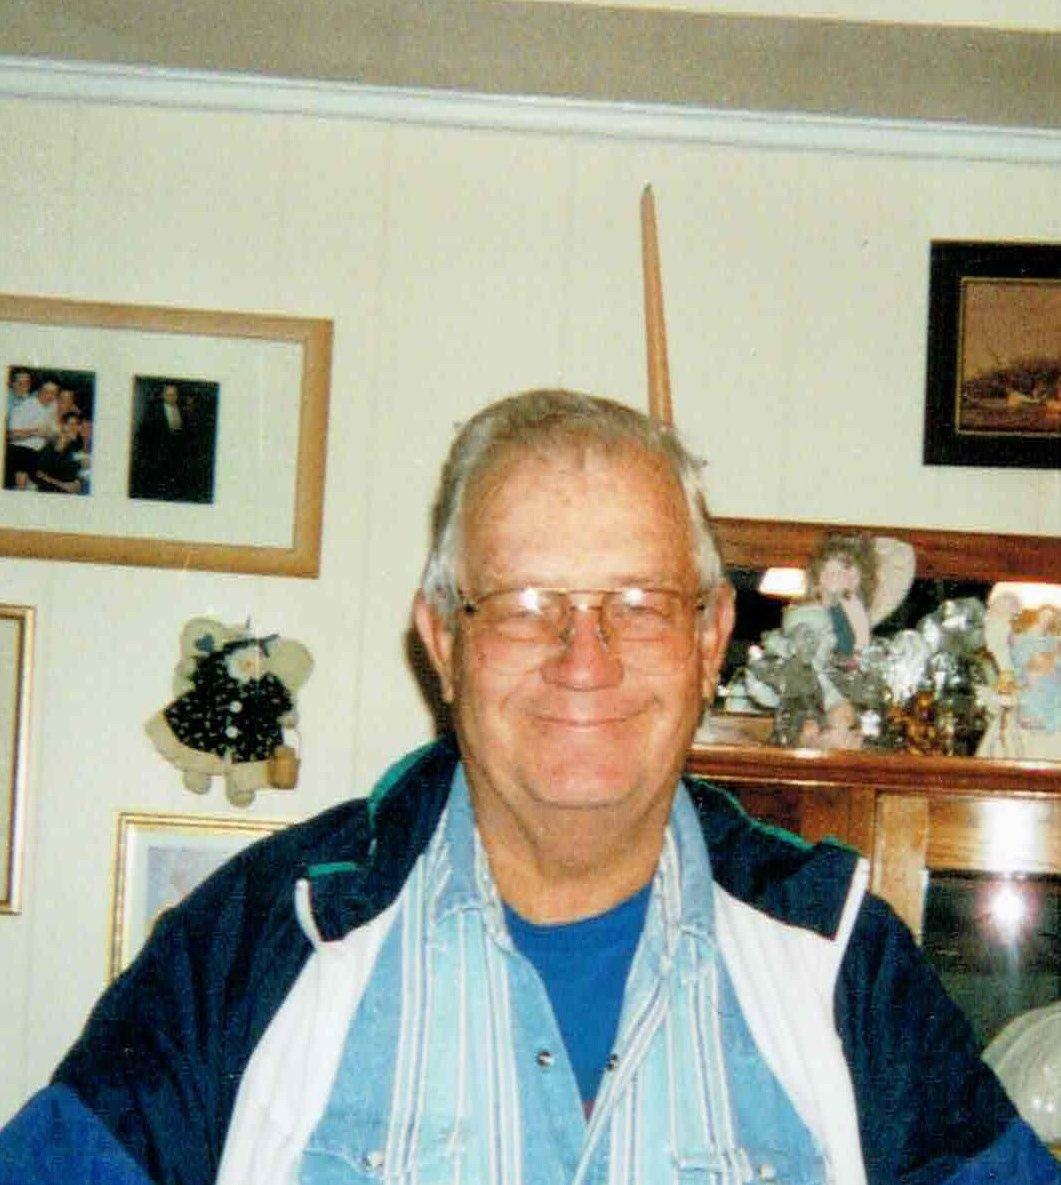 Hallmark obituaries starlocalmedia ronald ron darrell hallmark age 79 of flower mound texas passed away friday november 27 2015 at baylor regional medical center in grapevine izmirmasajfo